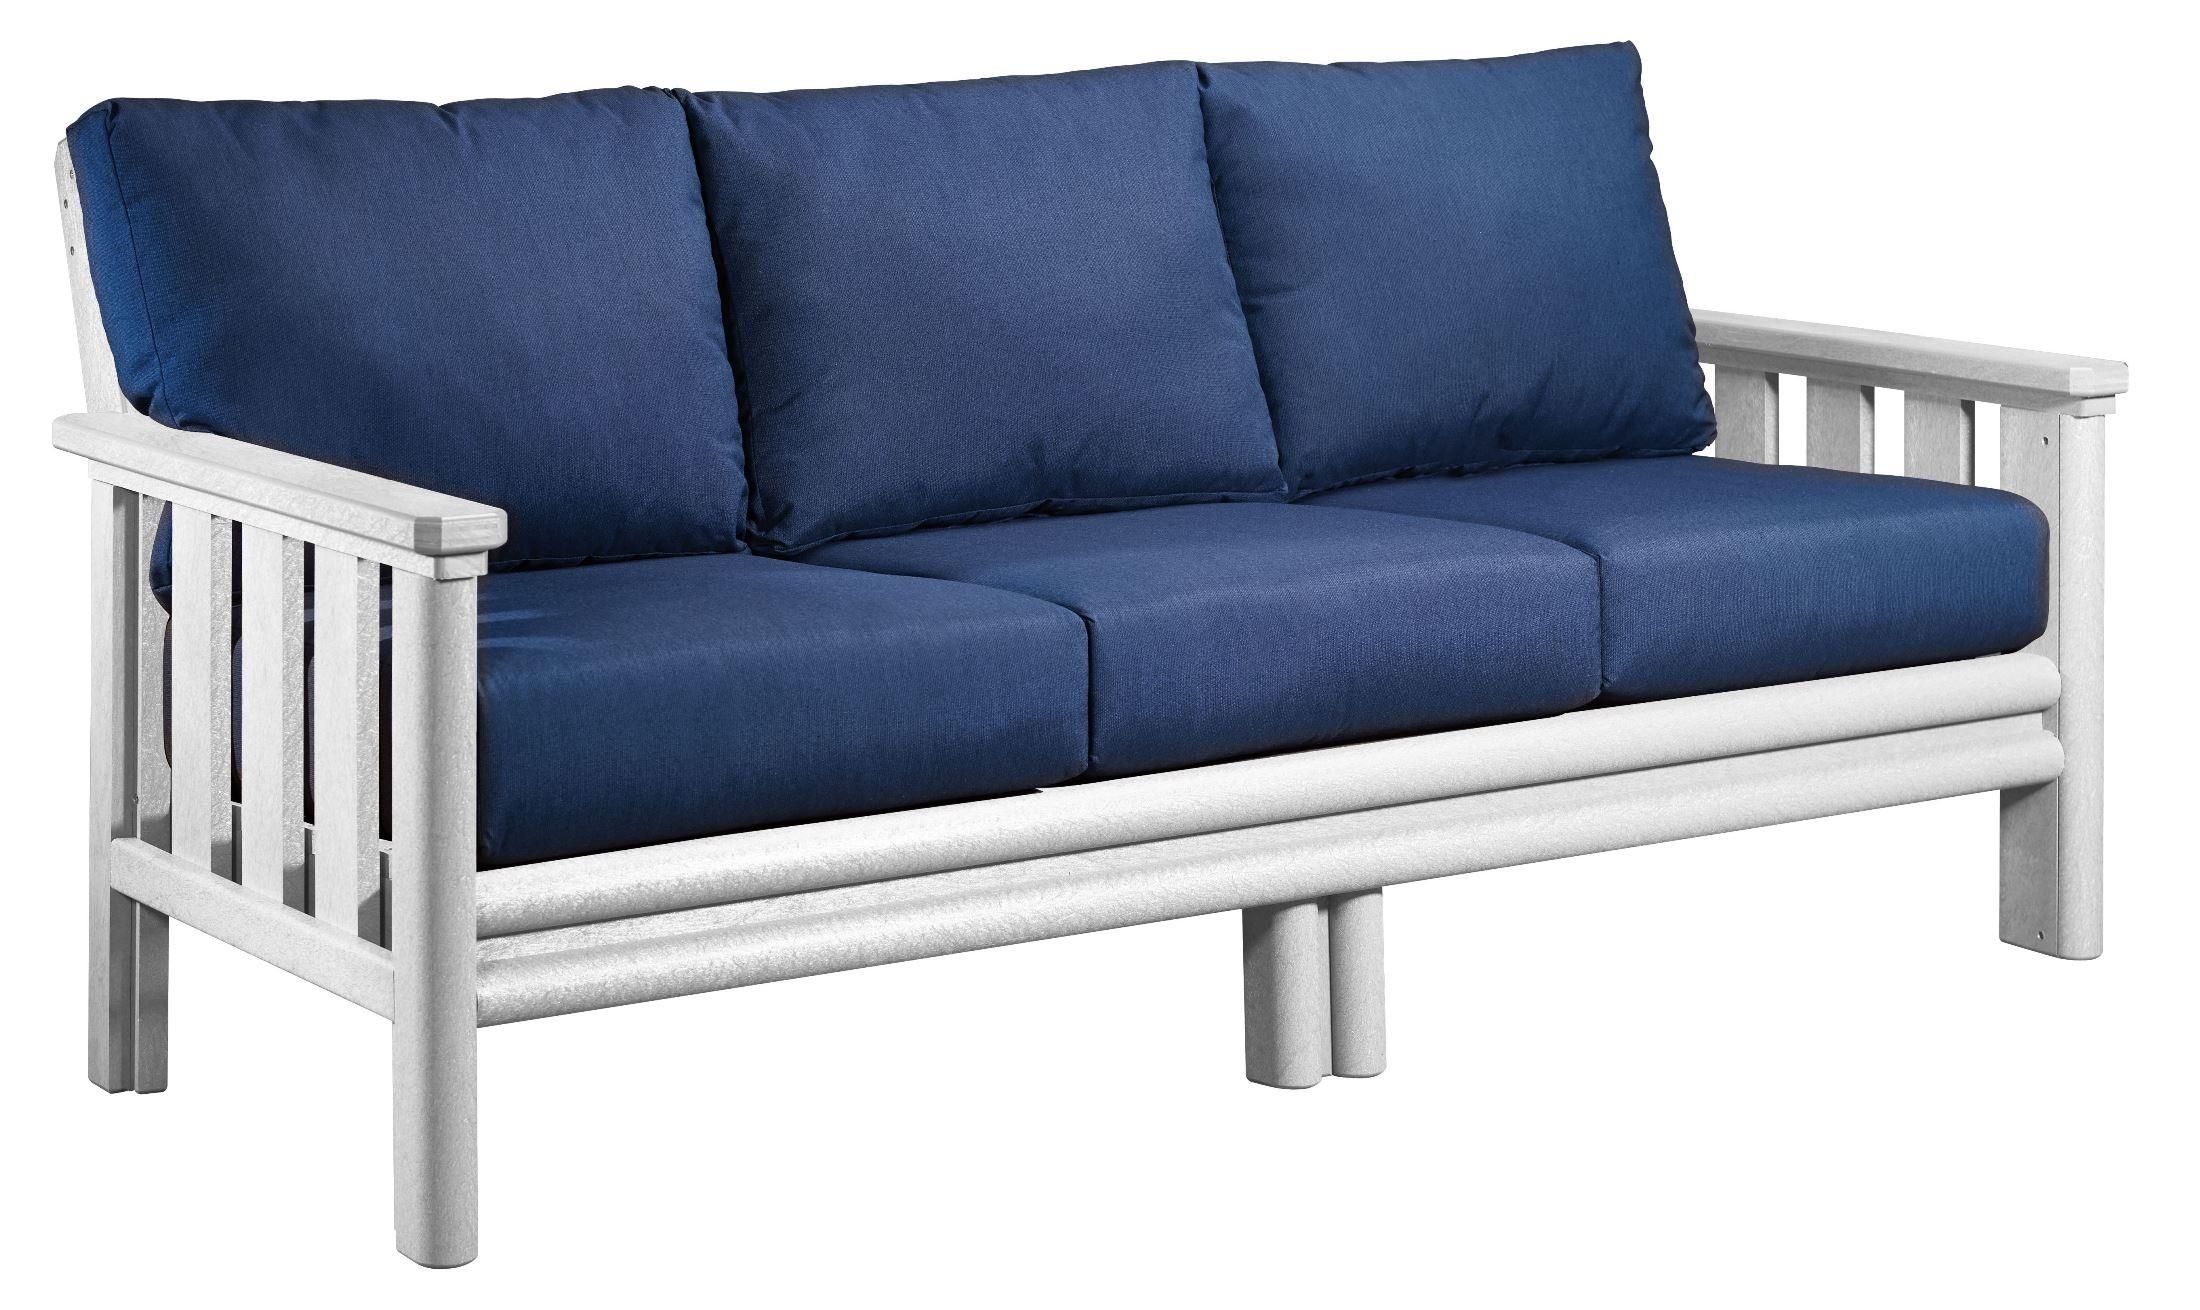 Stratford White Sofa With Indigo Blue Sunbrella Cushions